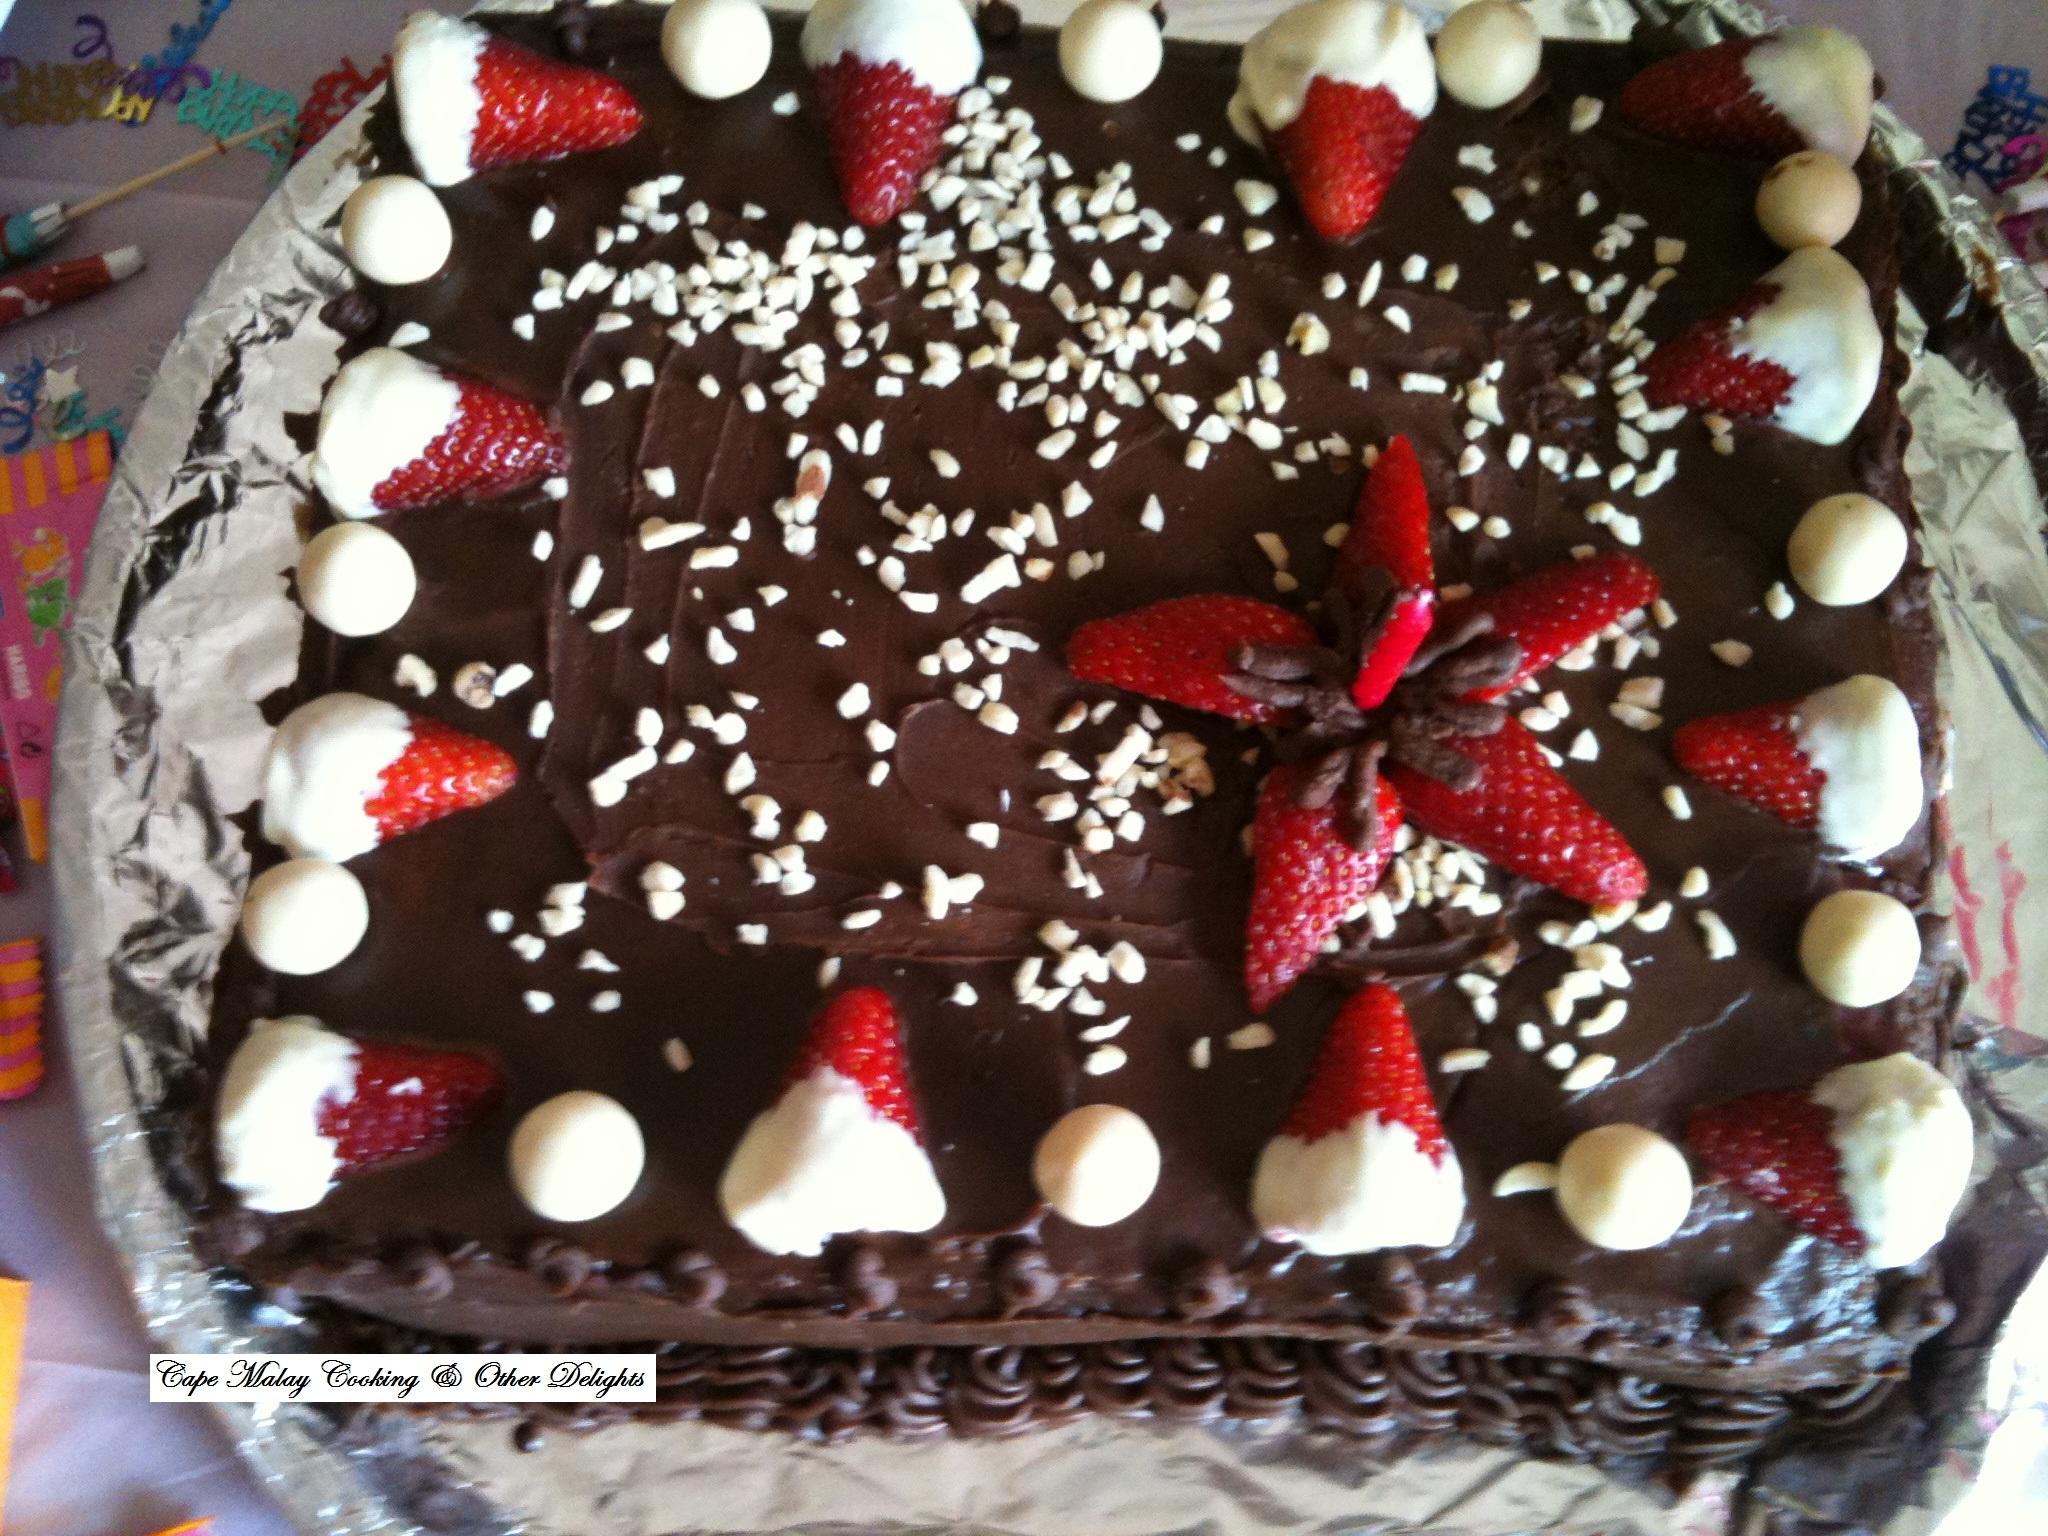 Cape Malay Chocolate Cake